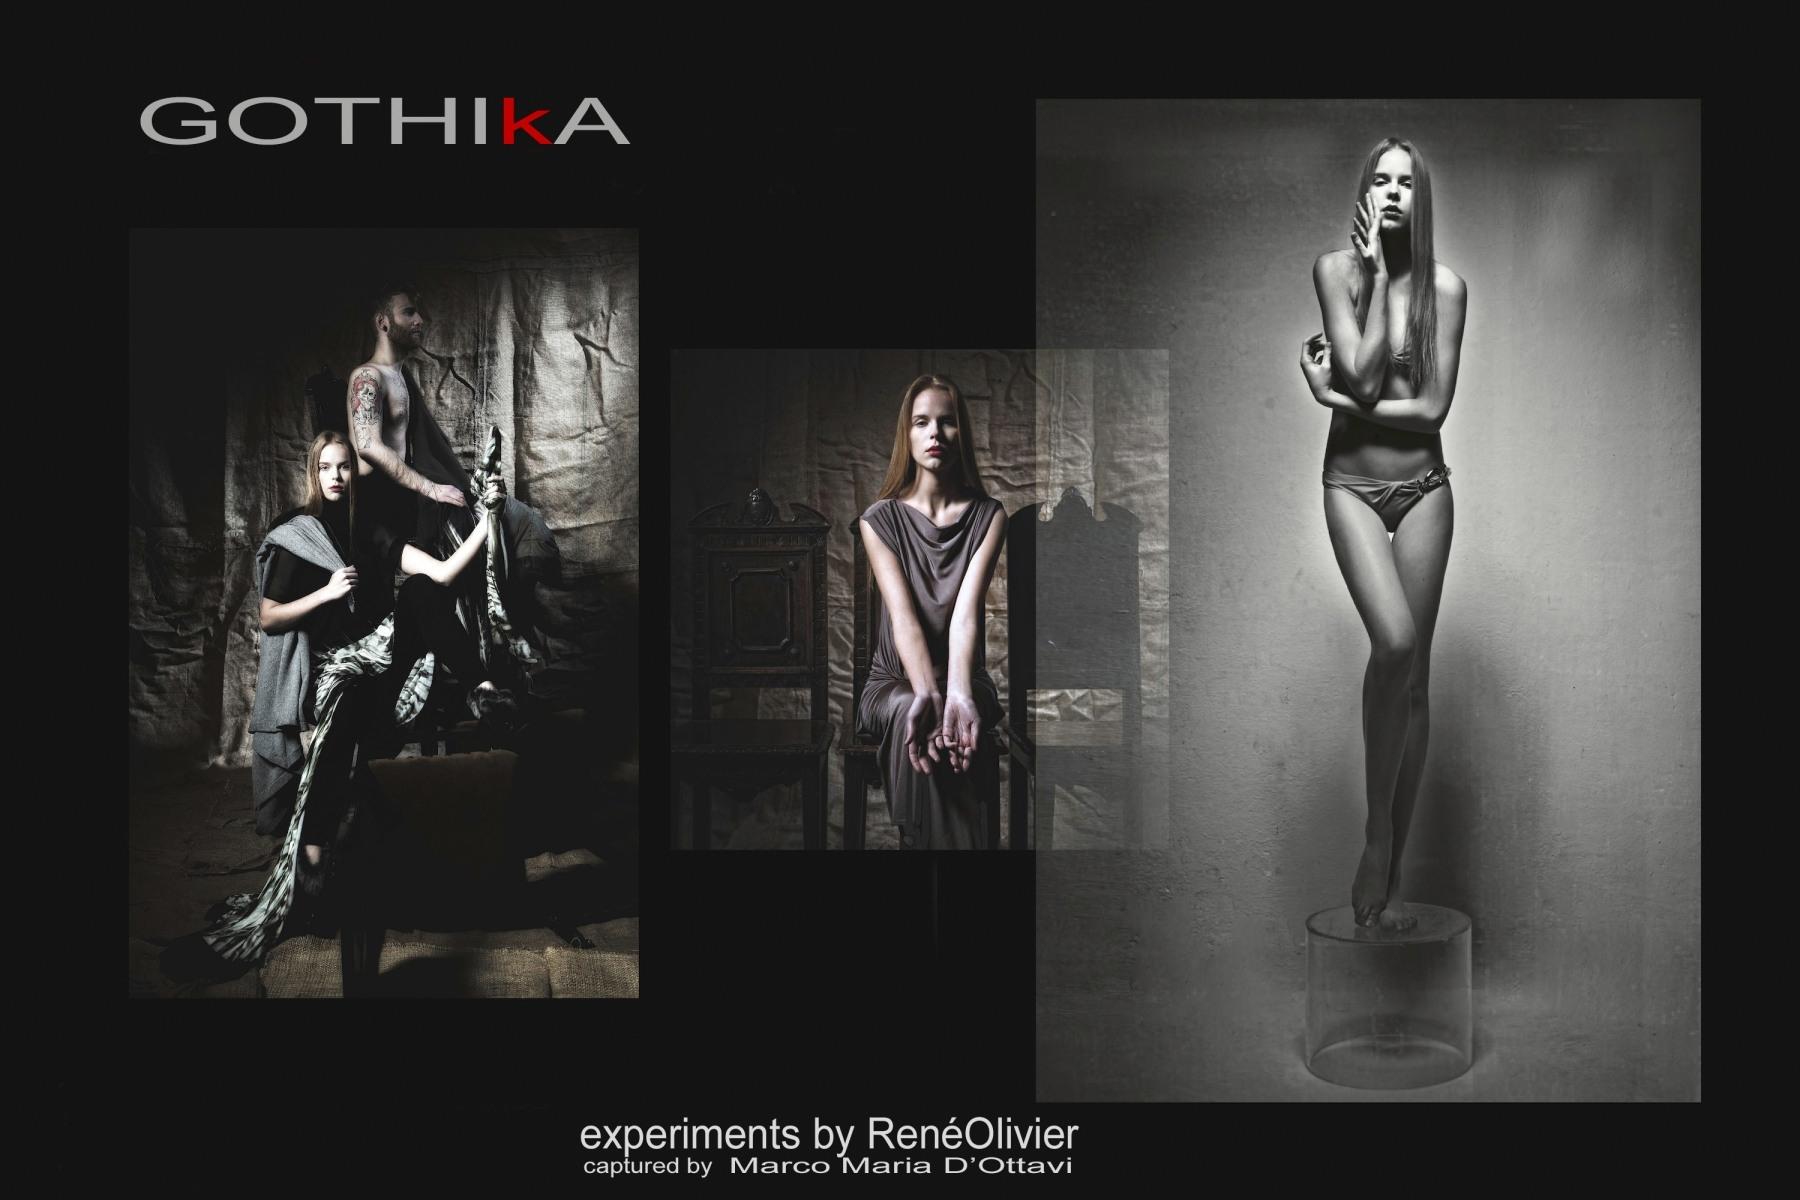 Gothika by Patané